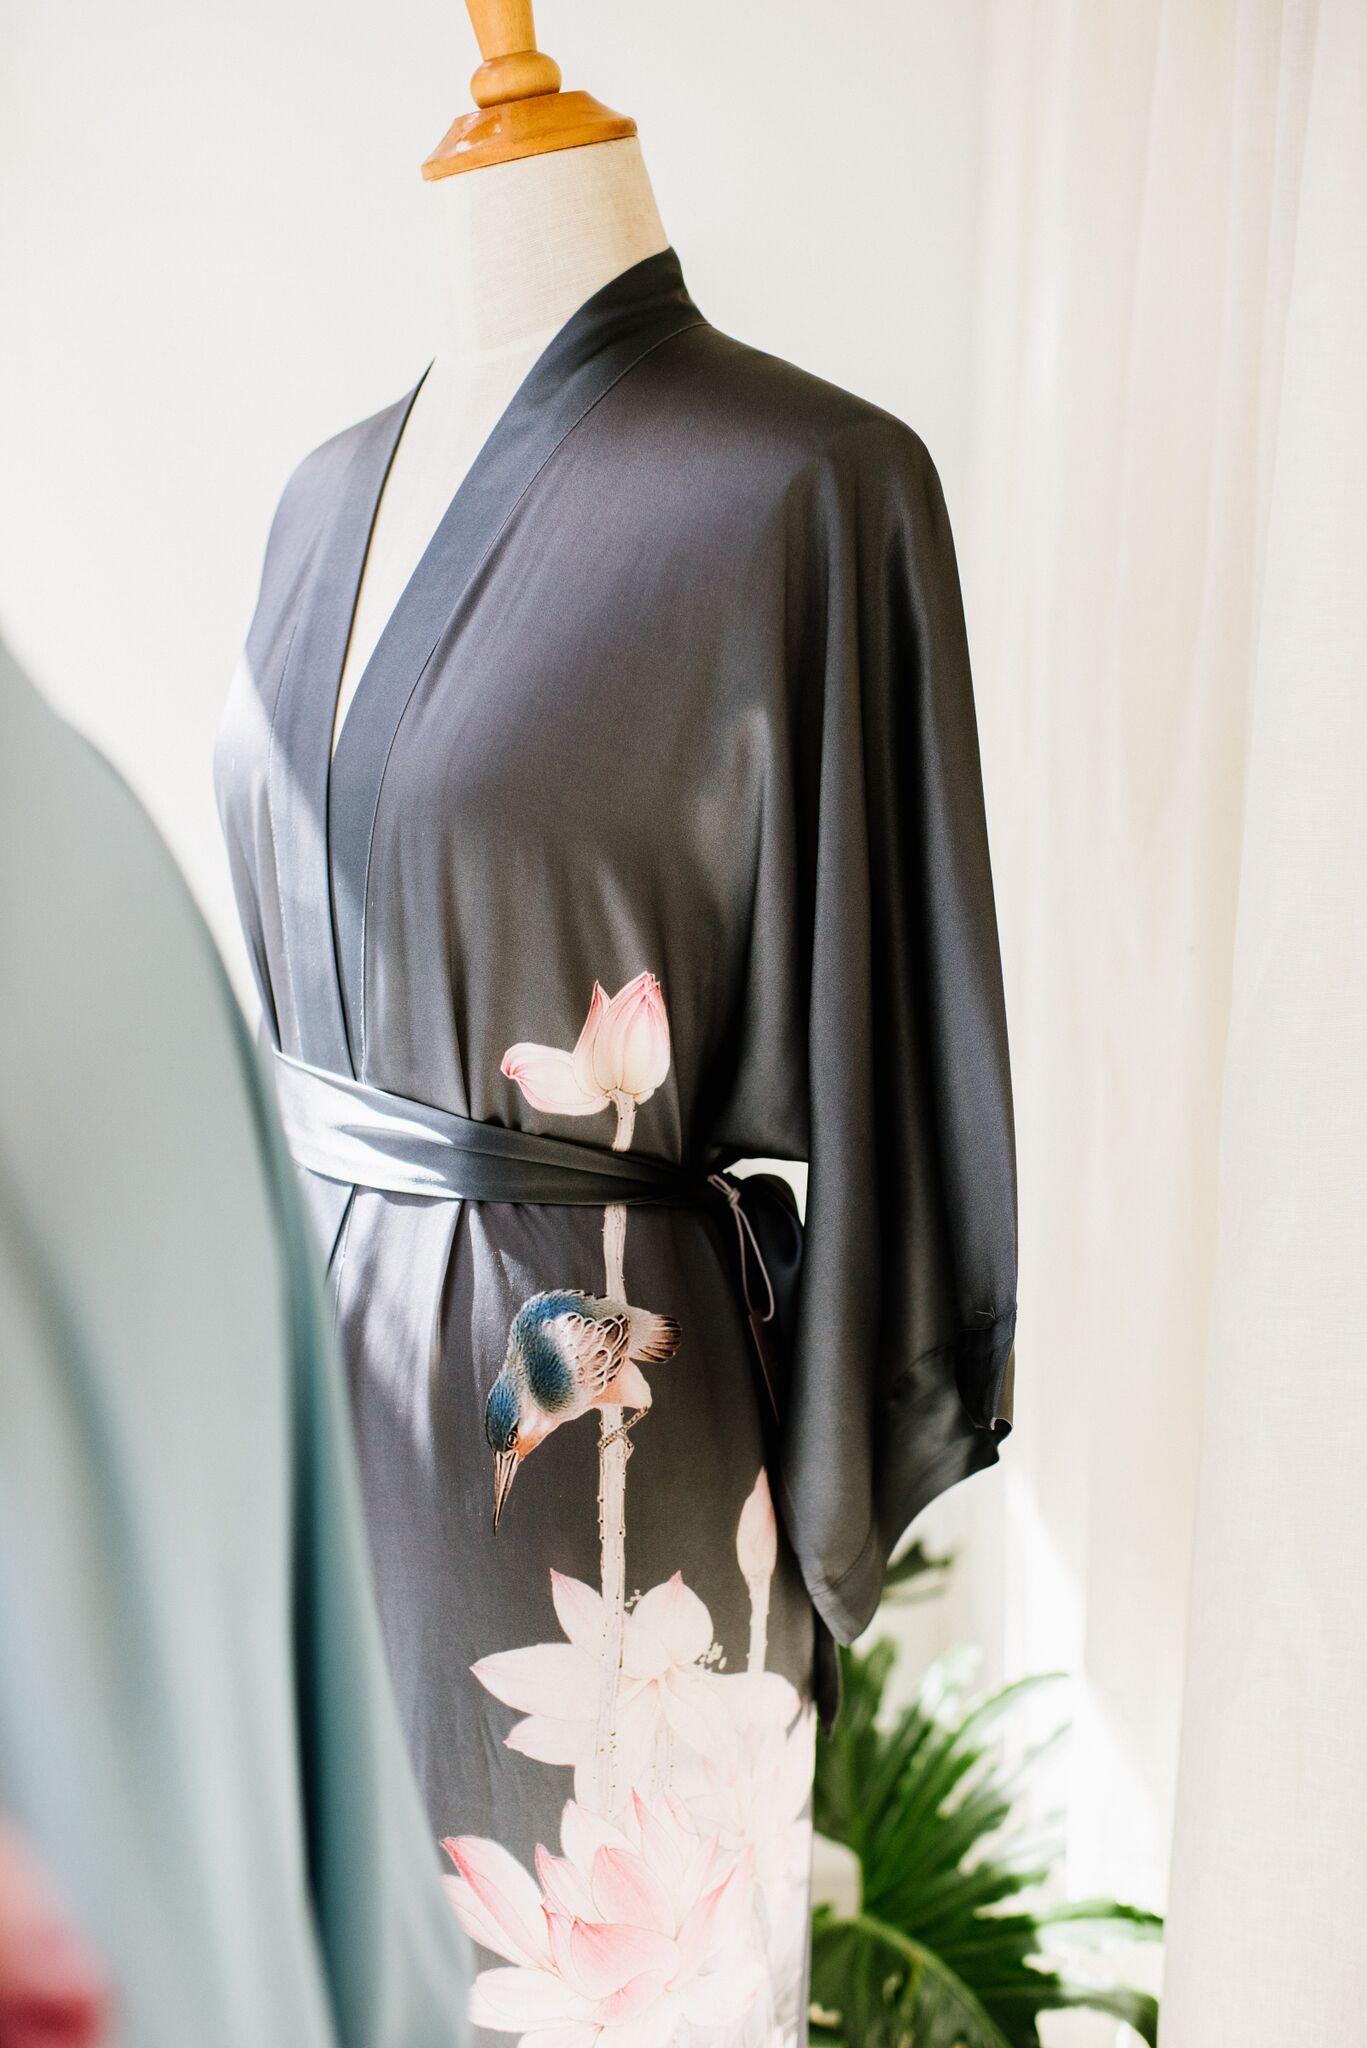 A hand-painted kimono